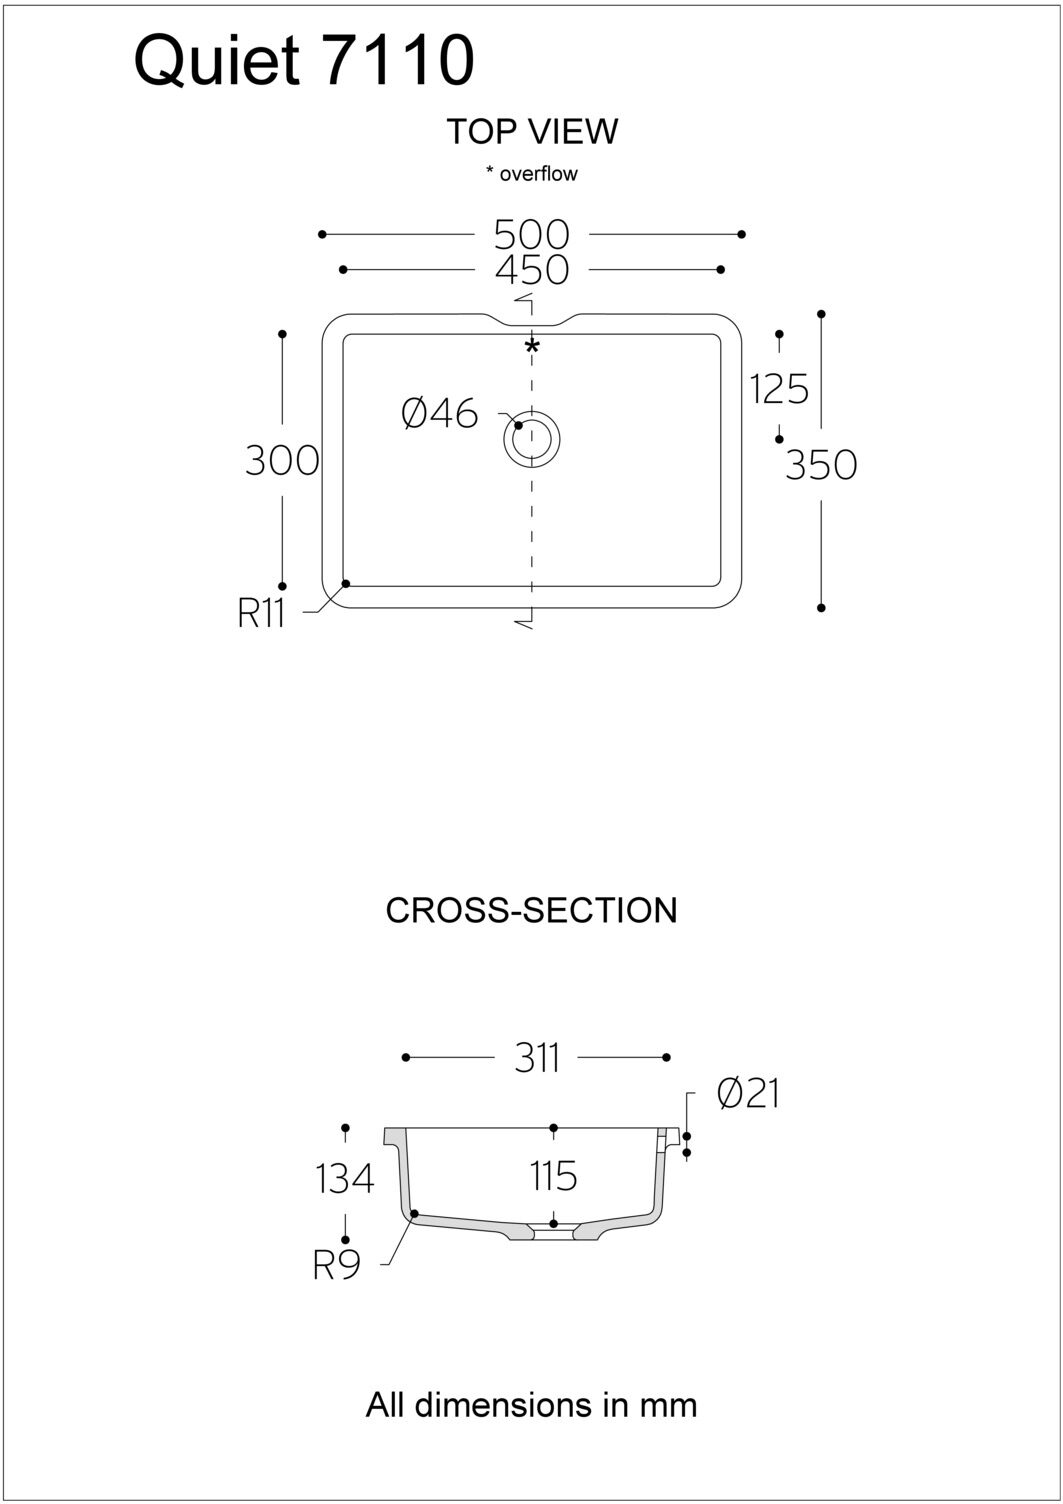 DUPONT_CORIAN_QUIET7110_2D_PDF-2020[0]